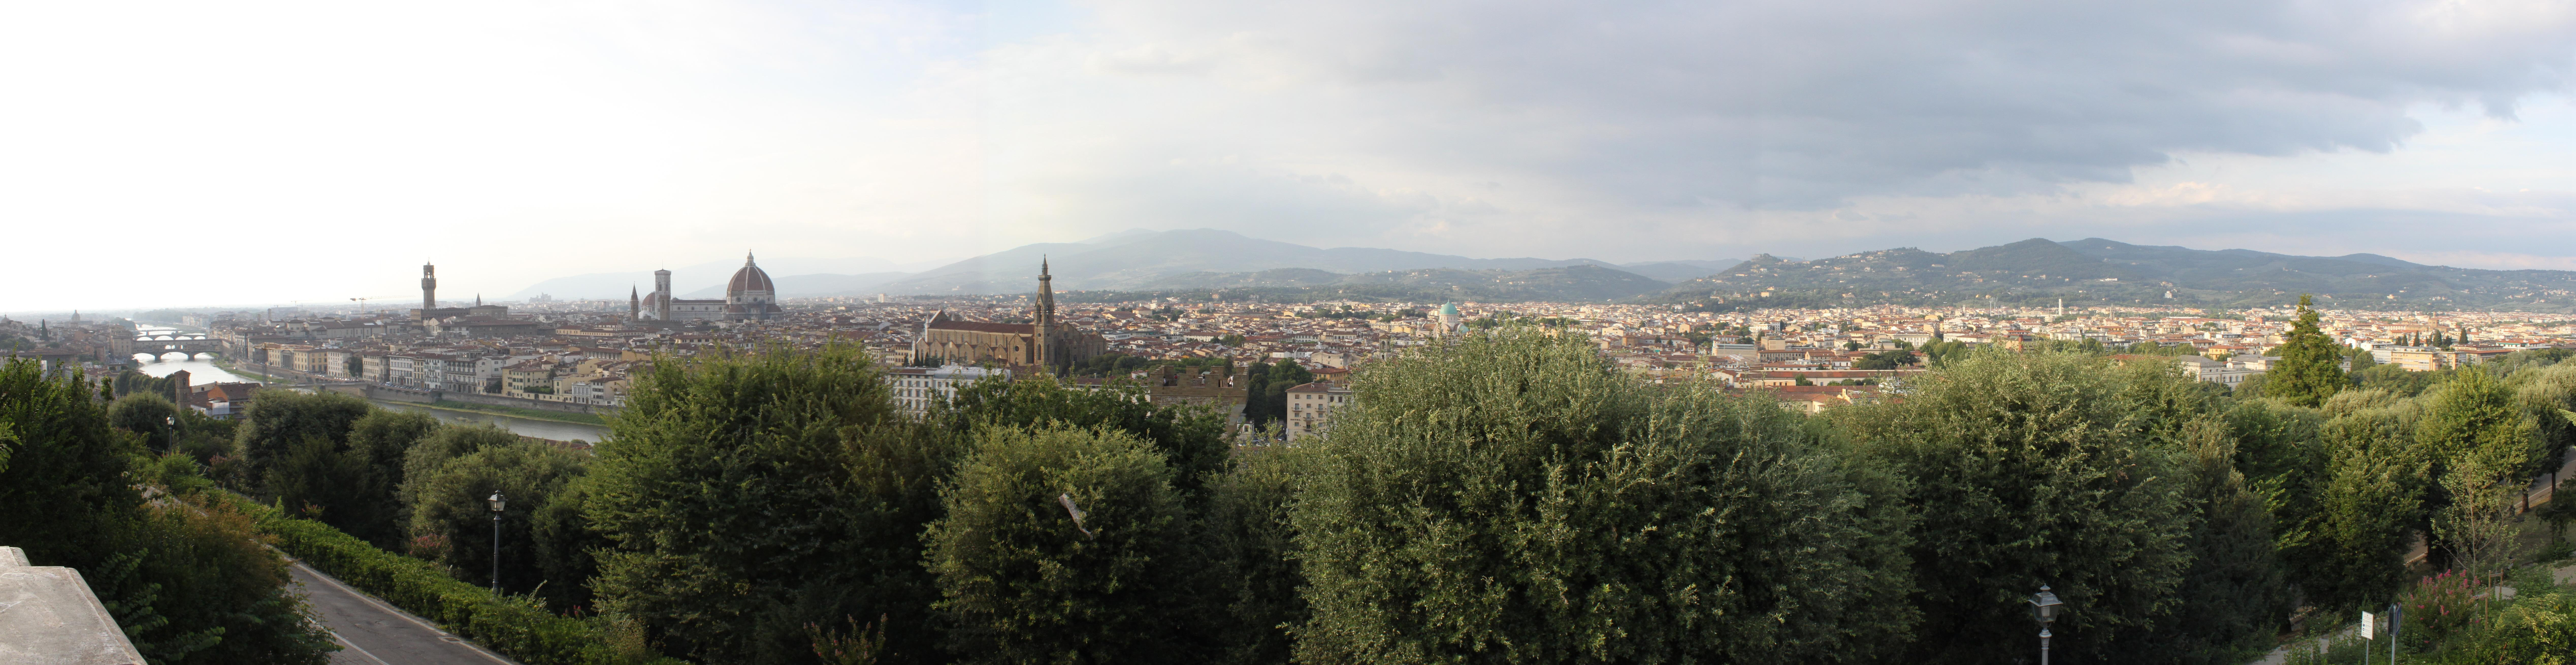 Панорама Флоренции, 2011 год. Вид на город.